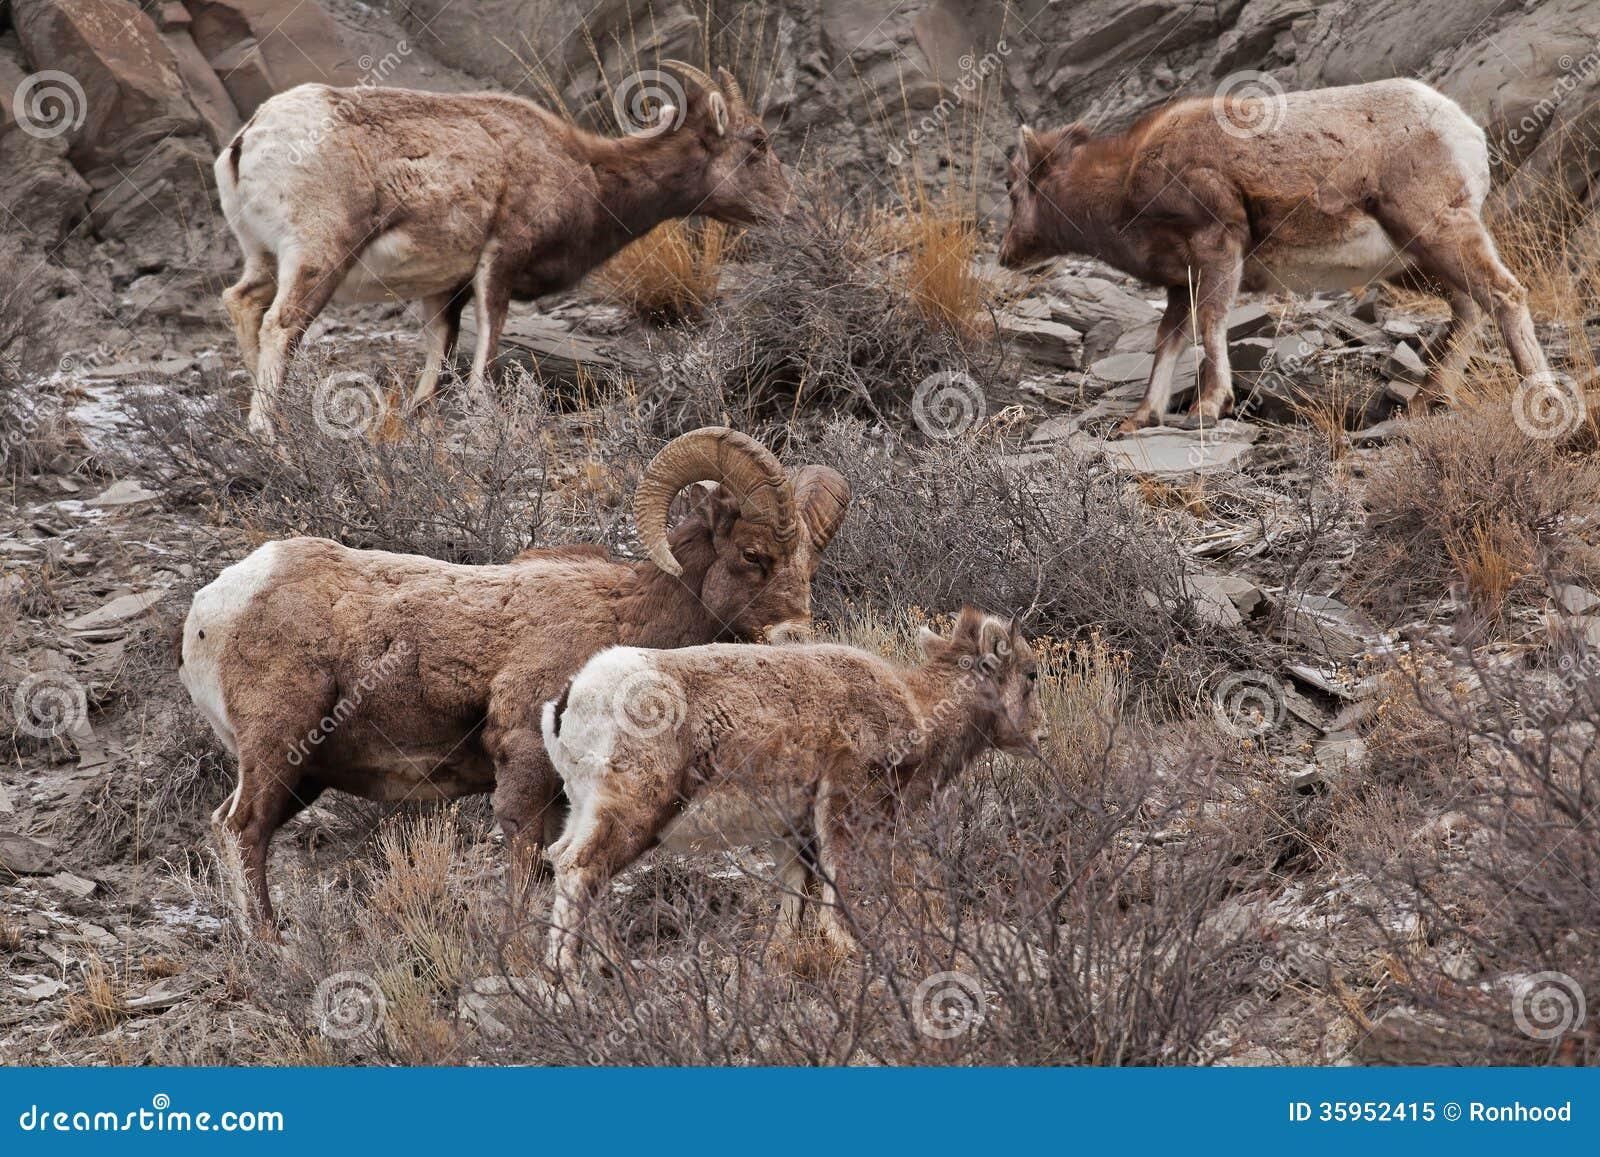 Rocky Mountain Sheed